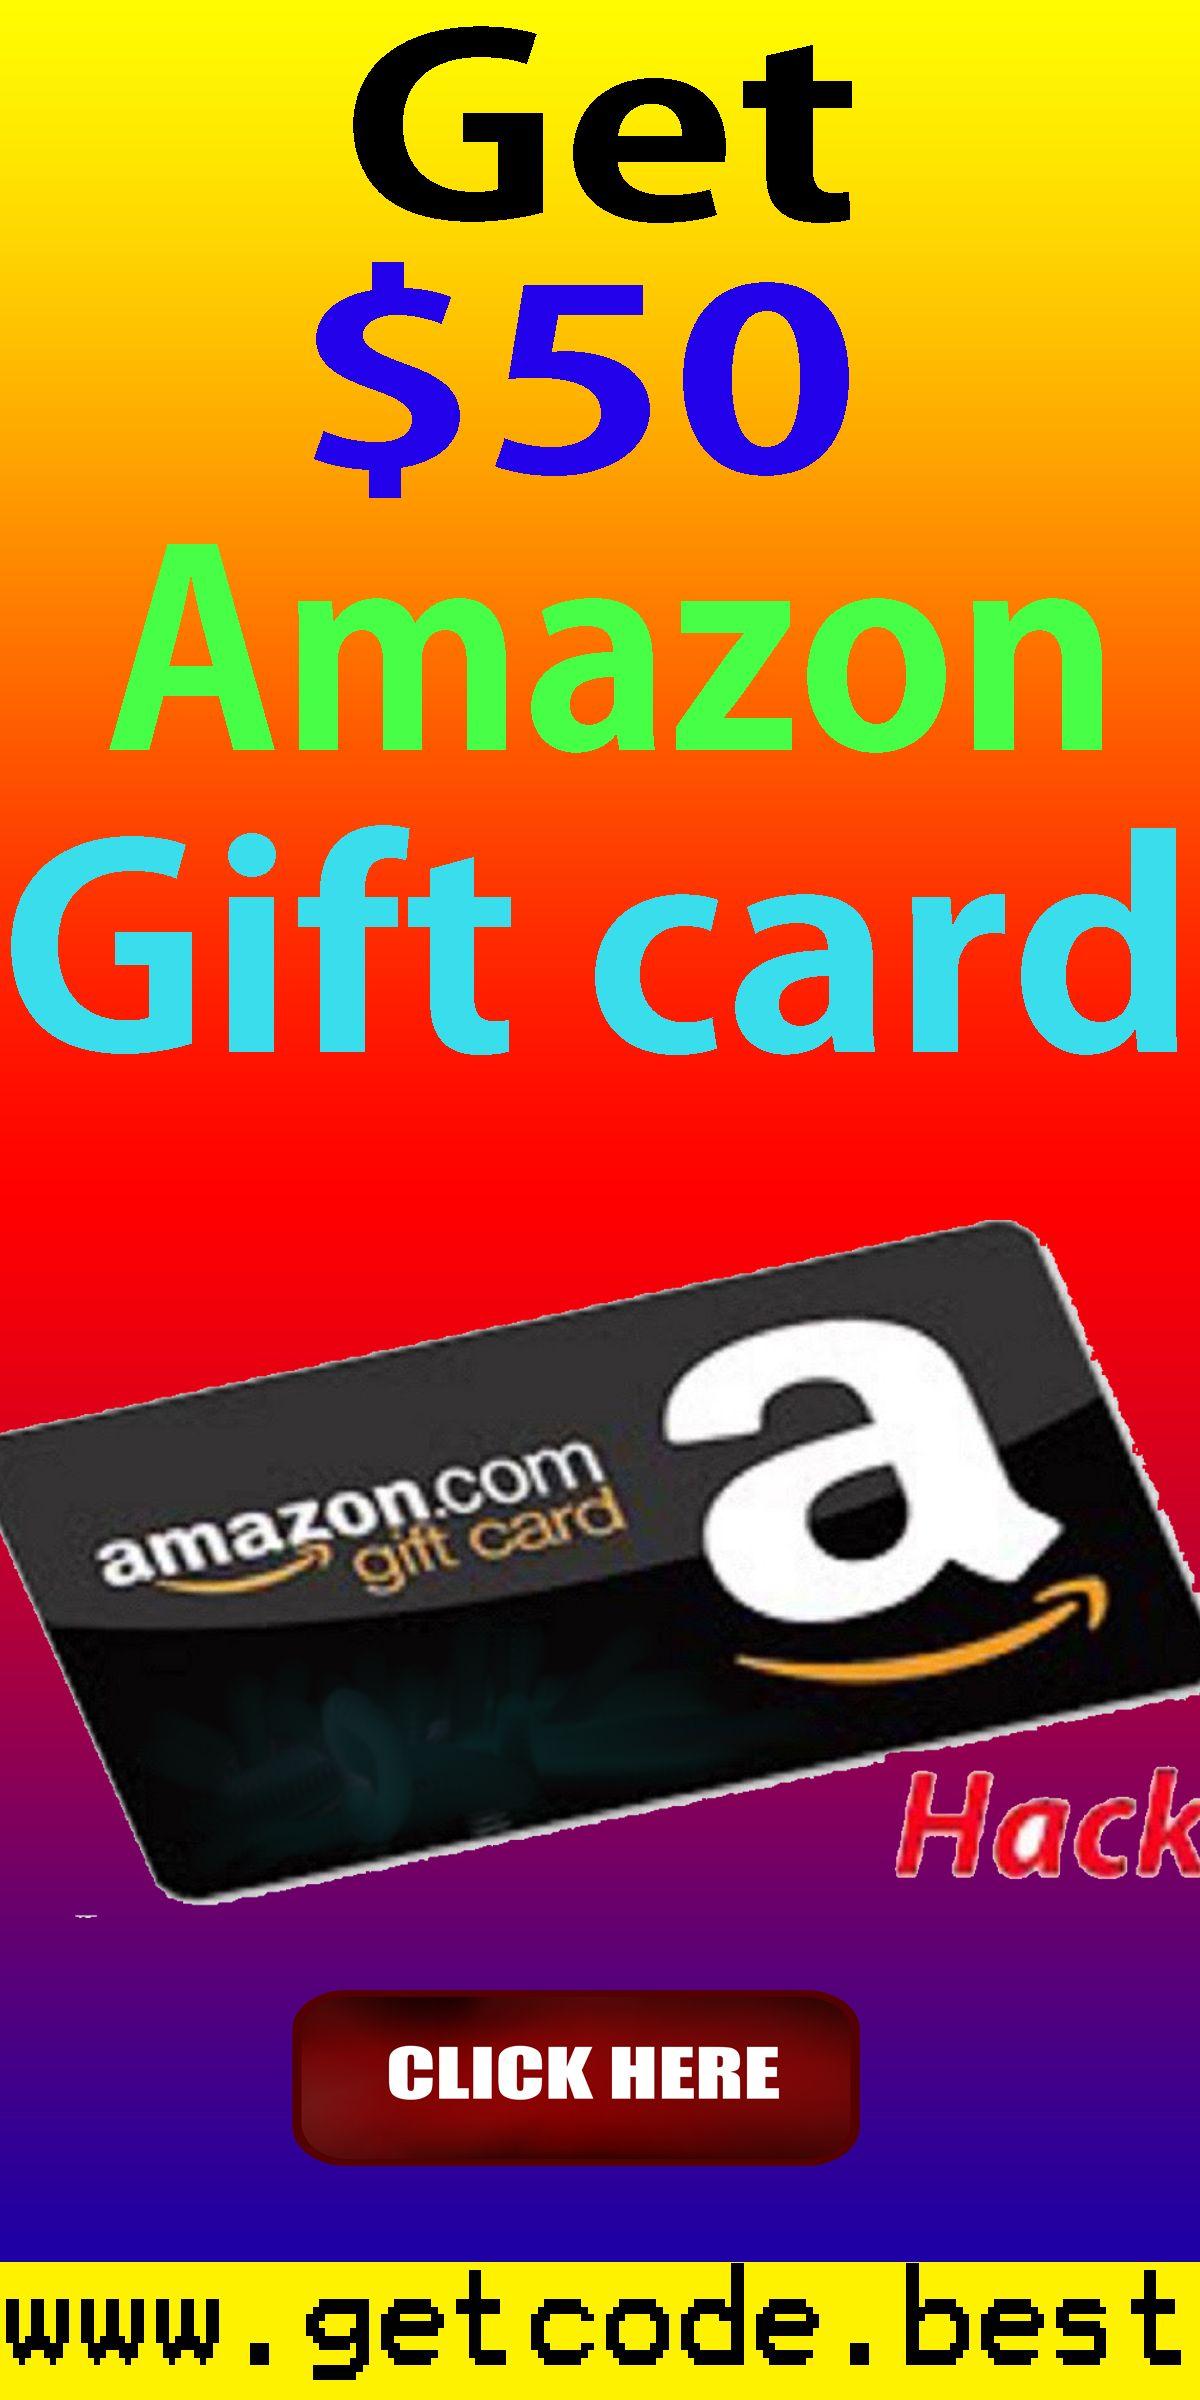 1000 Free Amazon Gift Cards Amazon Gift Card Free Amazon Gift Cards Free Amazon Products